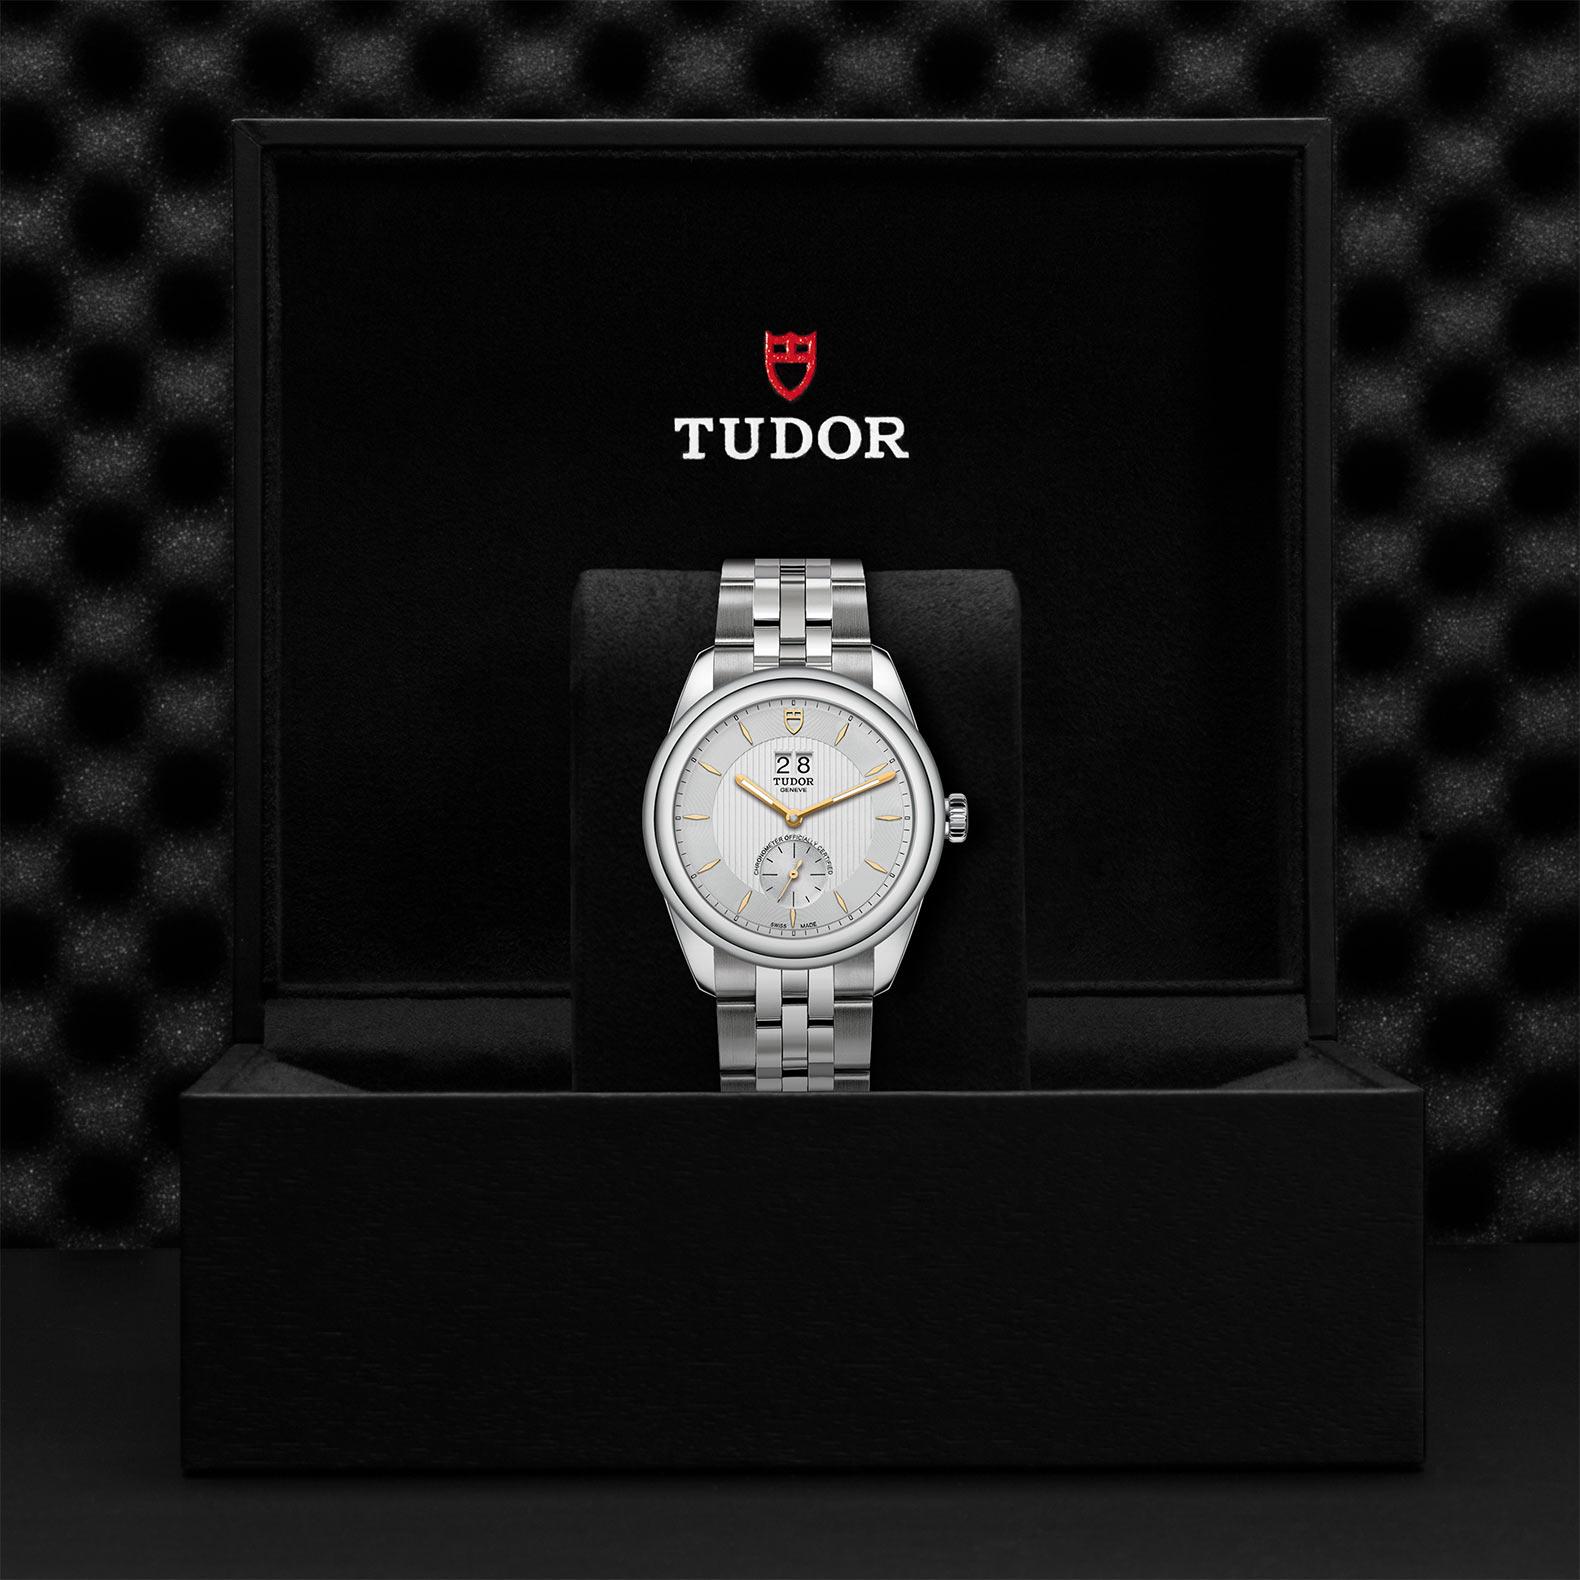 TUDOR Glamour Double Date M57100 0002 Presentationbox